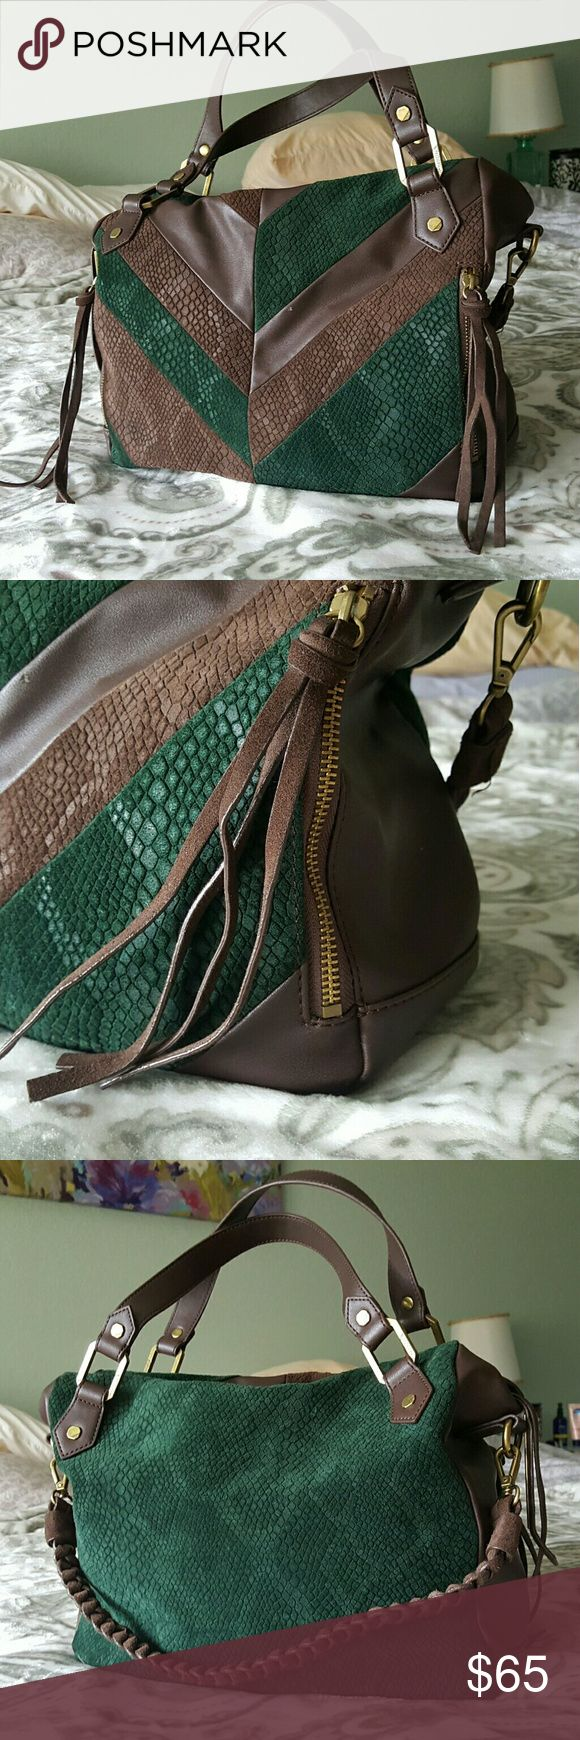 Ella Moss Handbag Dark green and brown suede/leather Ella Moss bag. Used once. retail $120 Ella Moss Bags Shoulder Bags